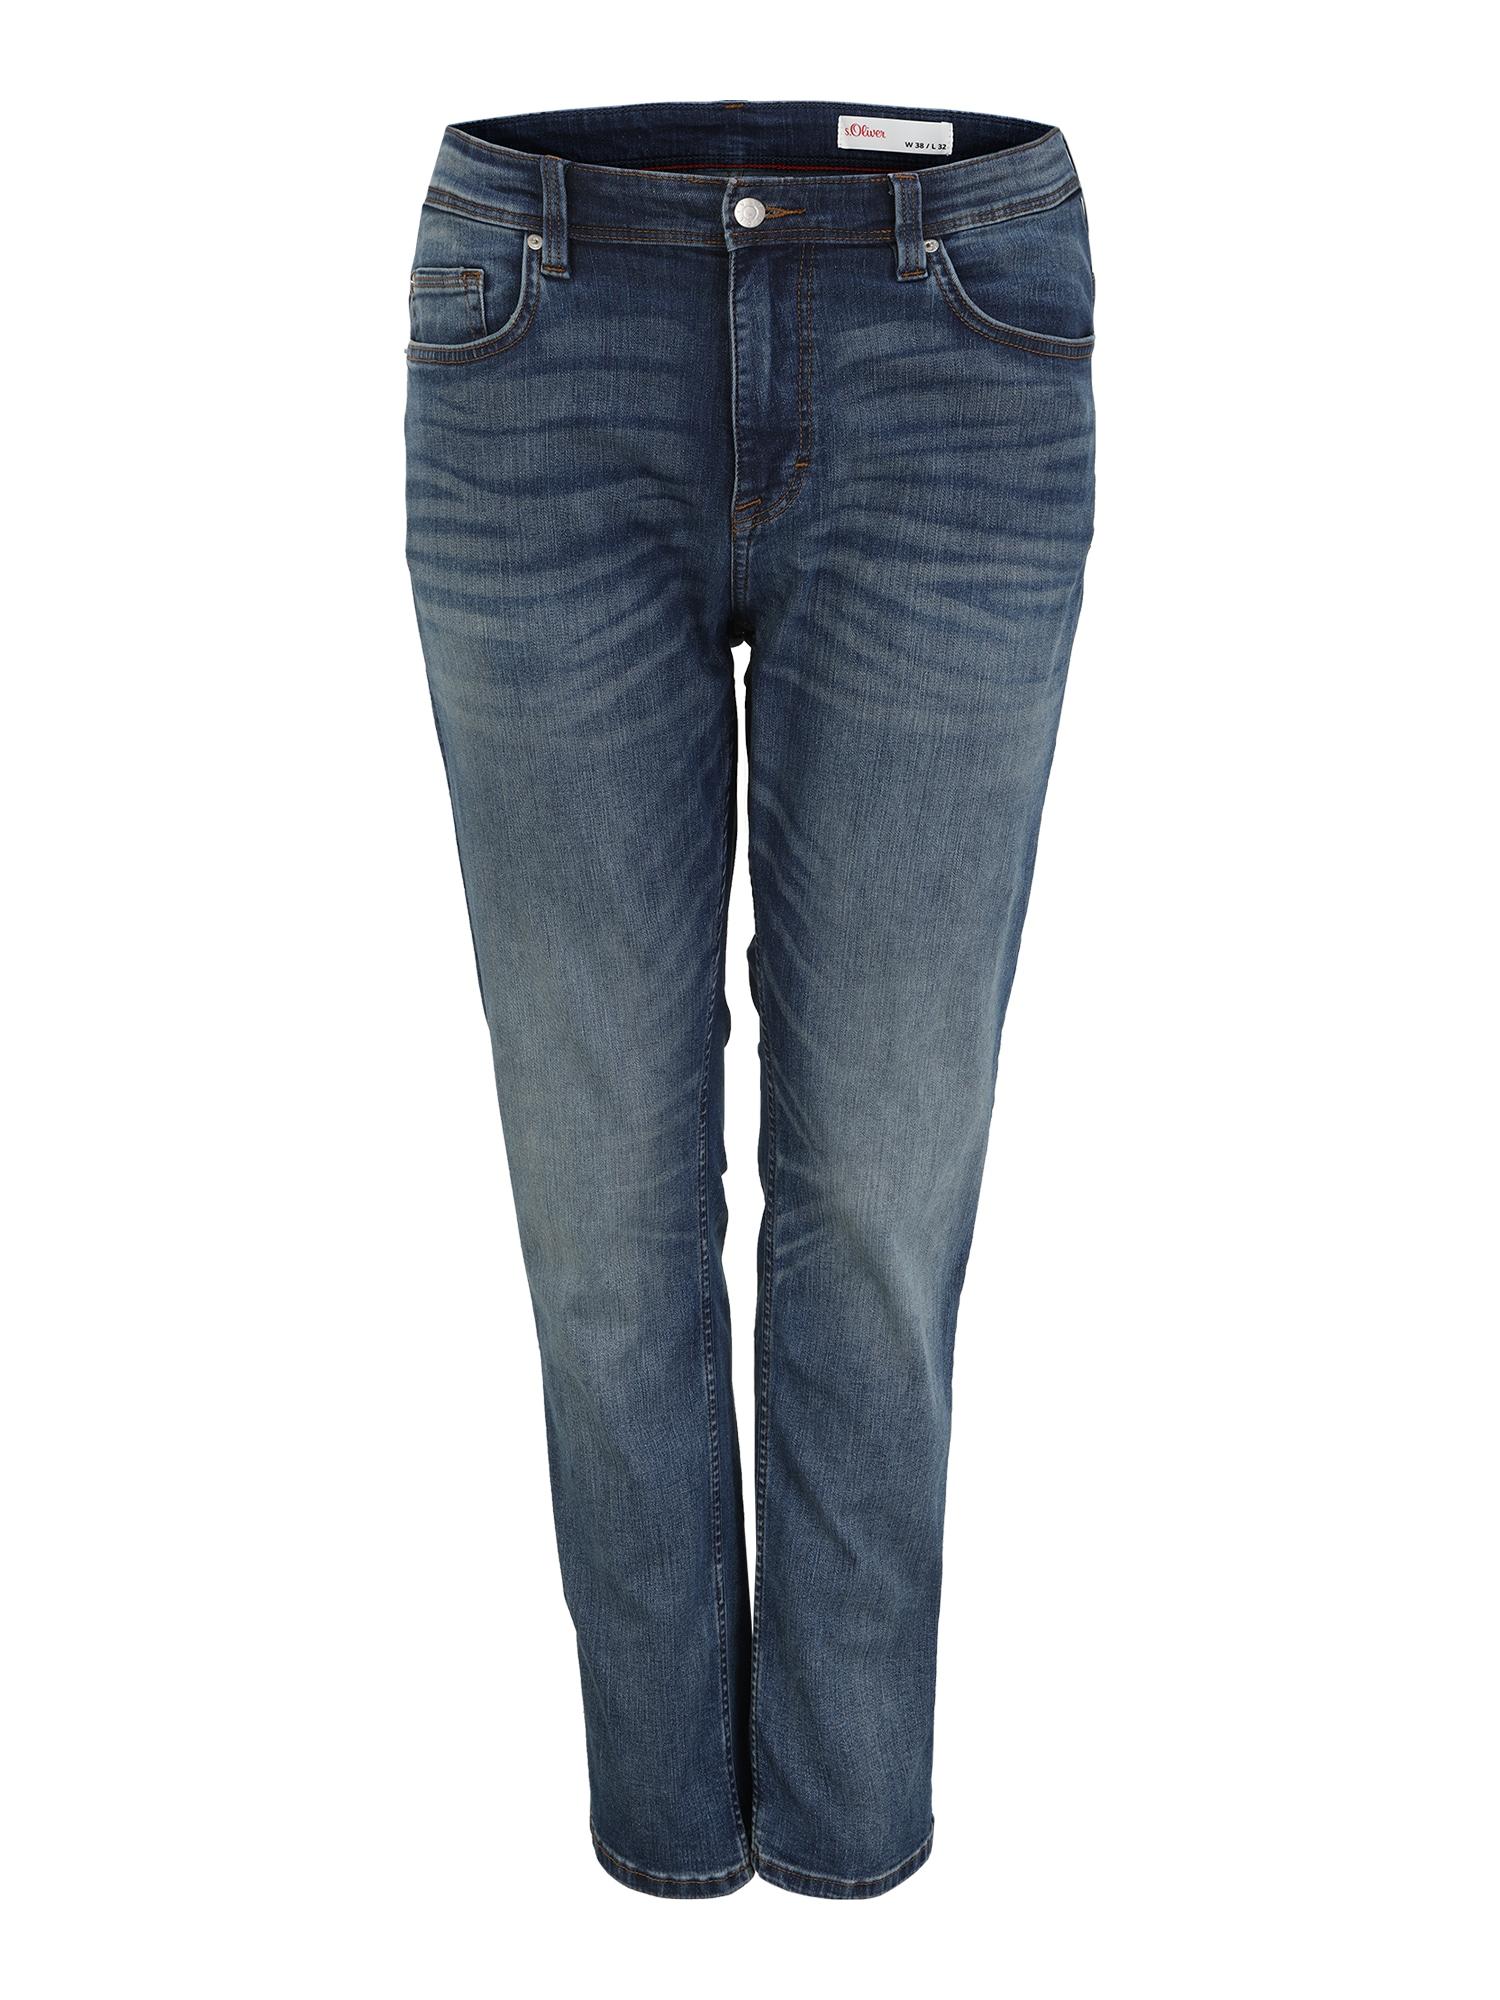 s.Oliver Red Label Big & Tall Džinsai tamsiai (džinso) mėlyna